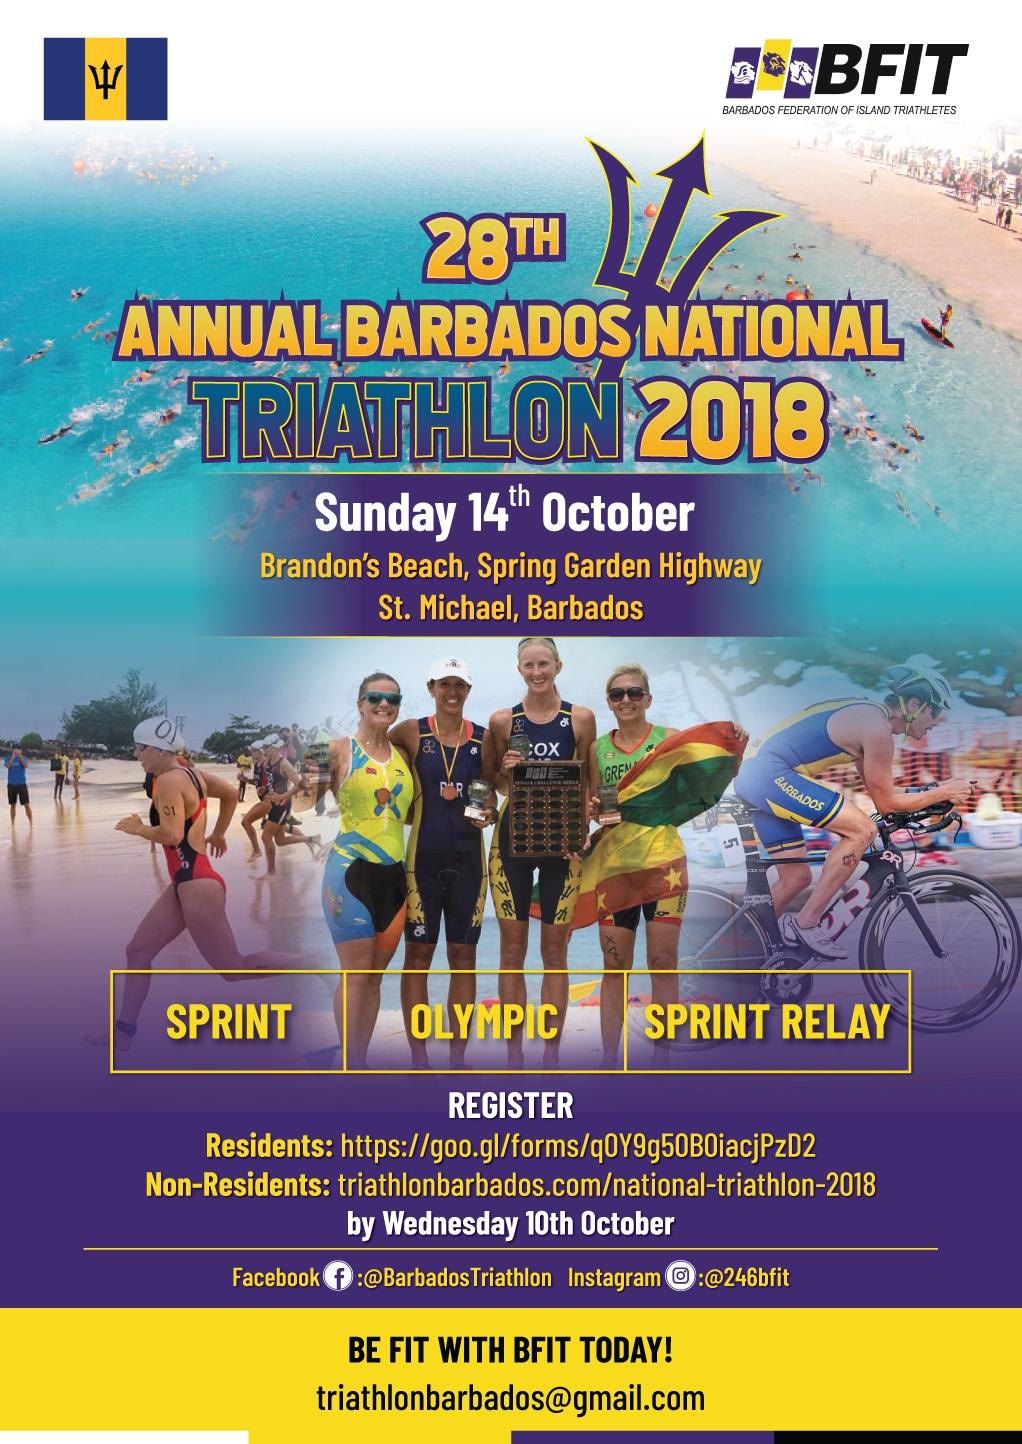 28th Annual Barbados National Triathlon Championships 2018